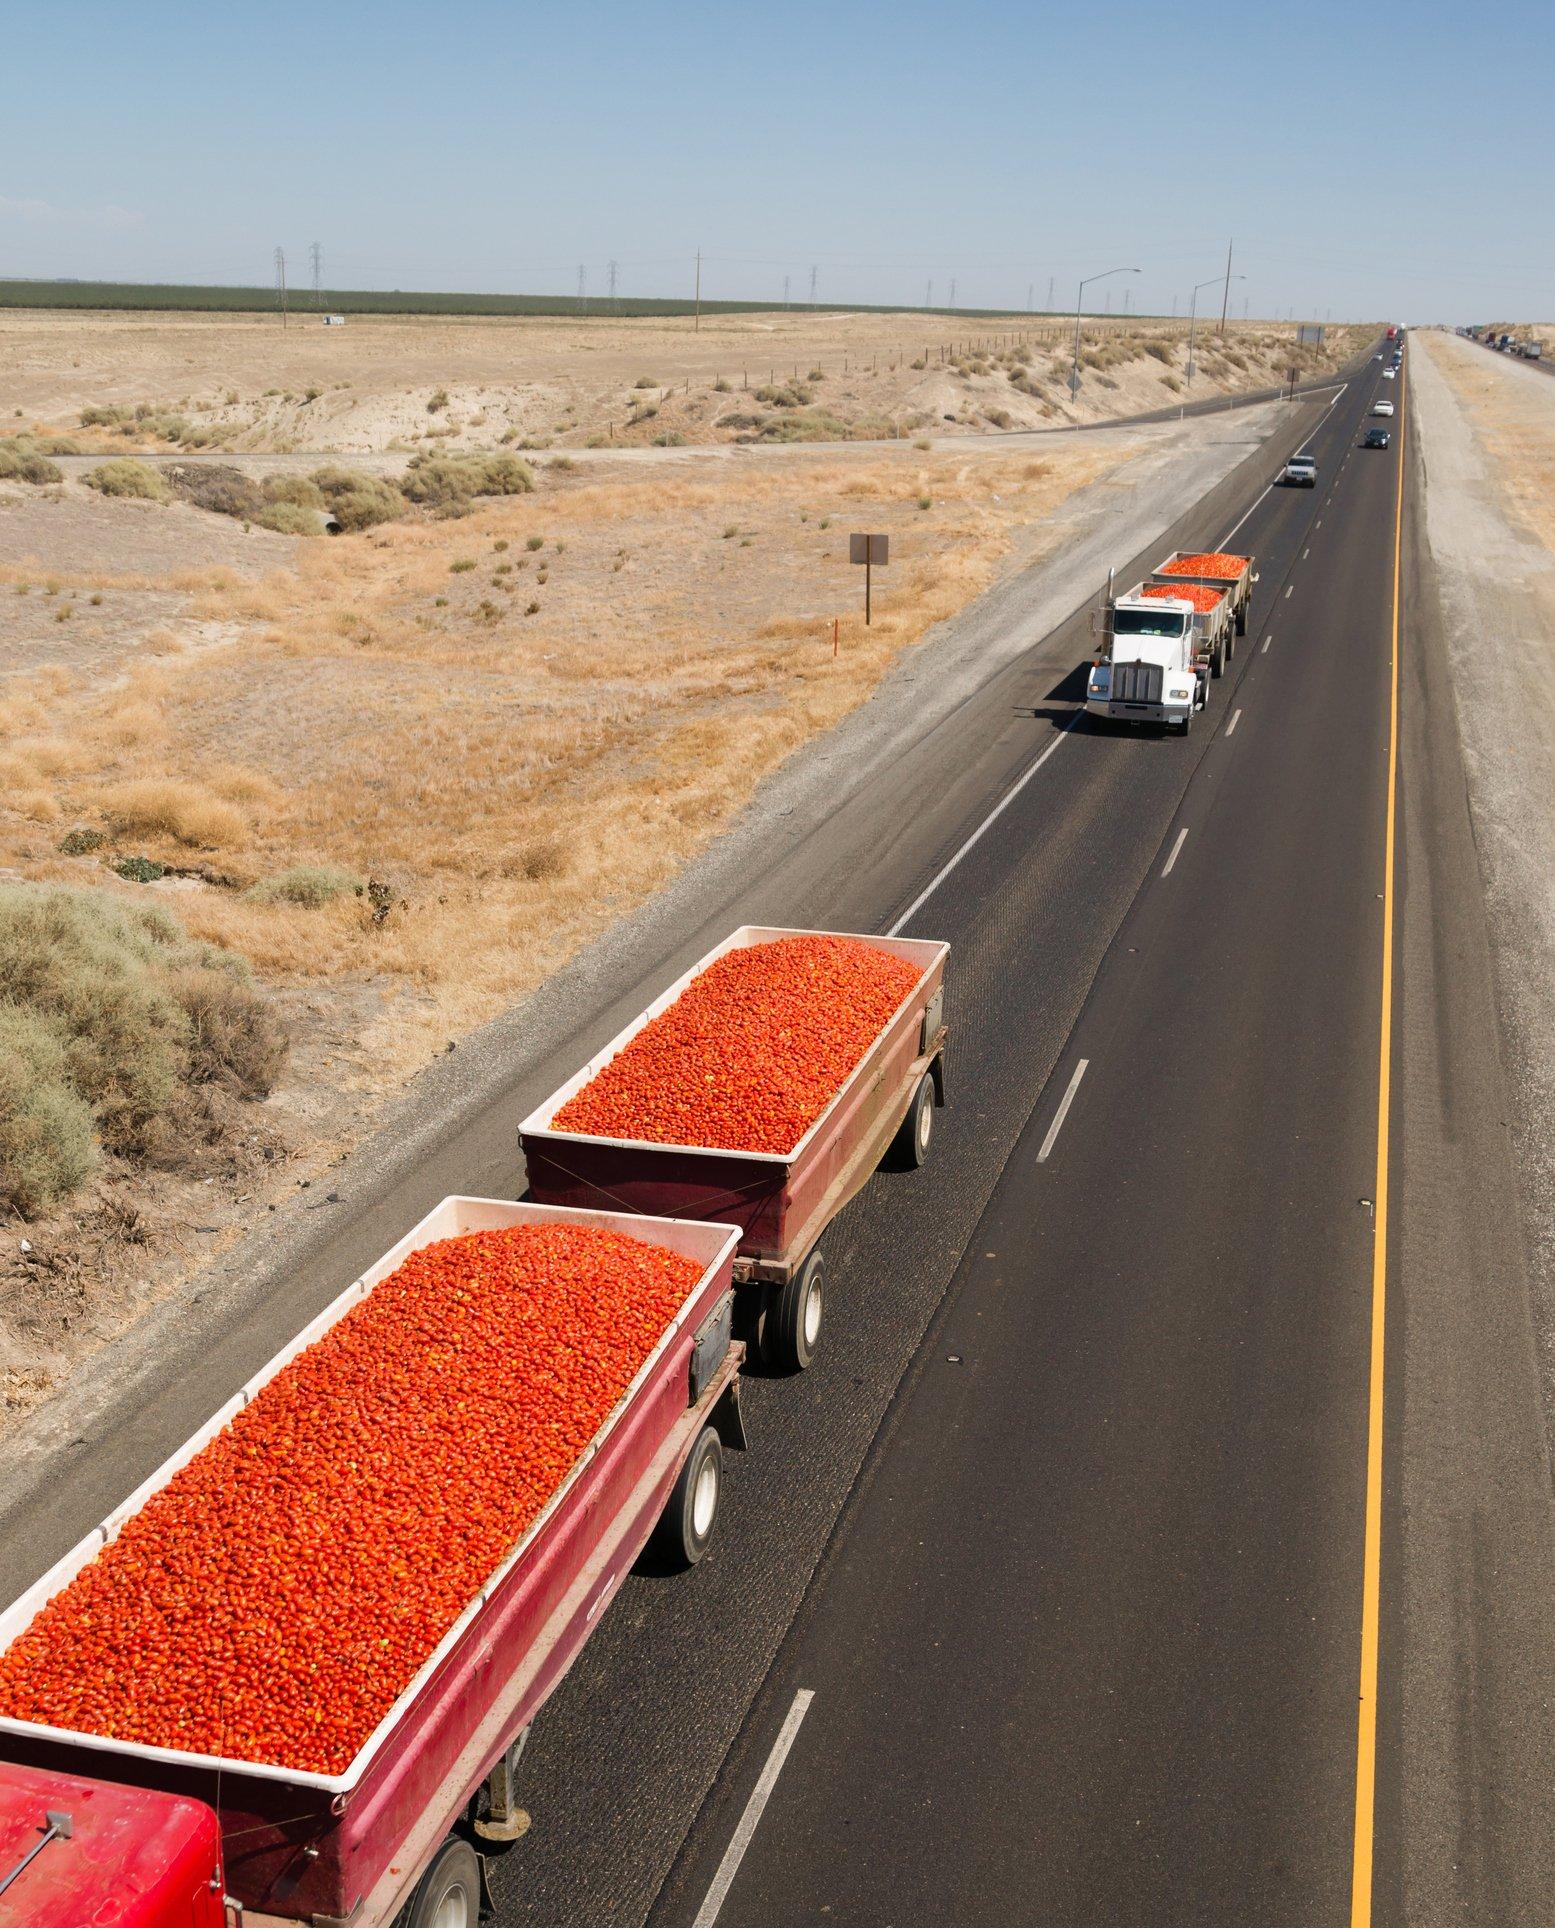 tomatoes in trucks